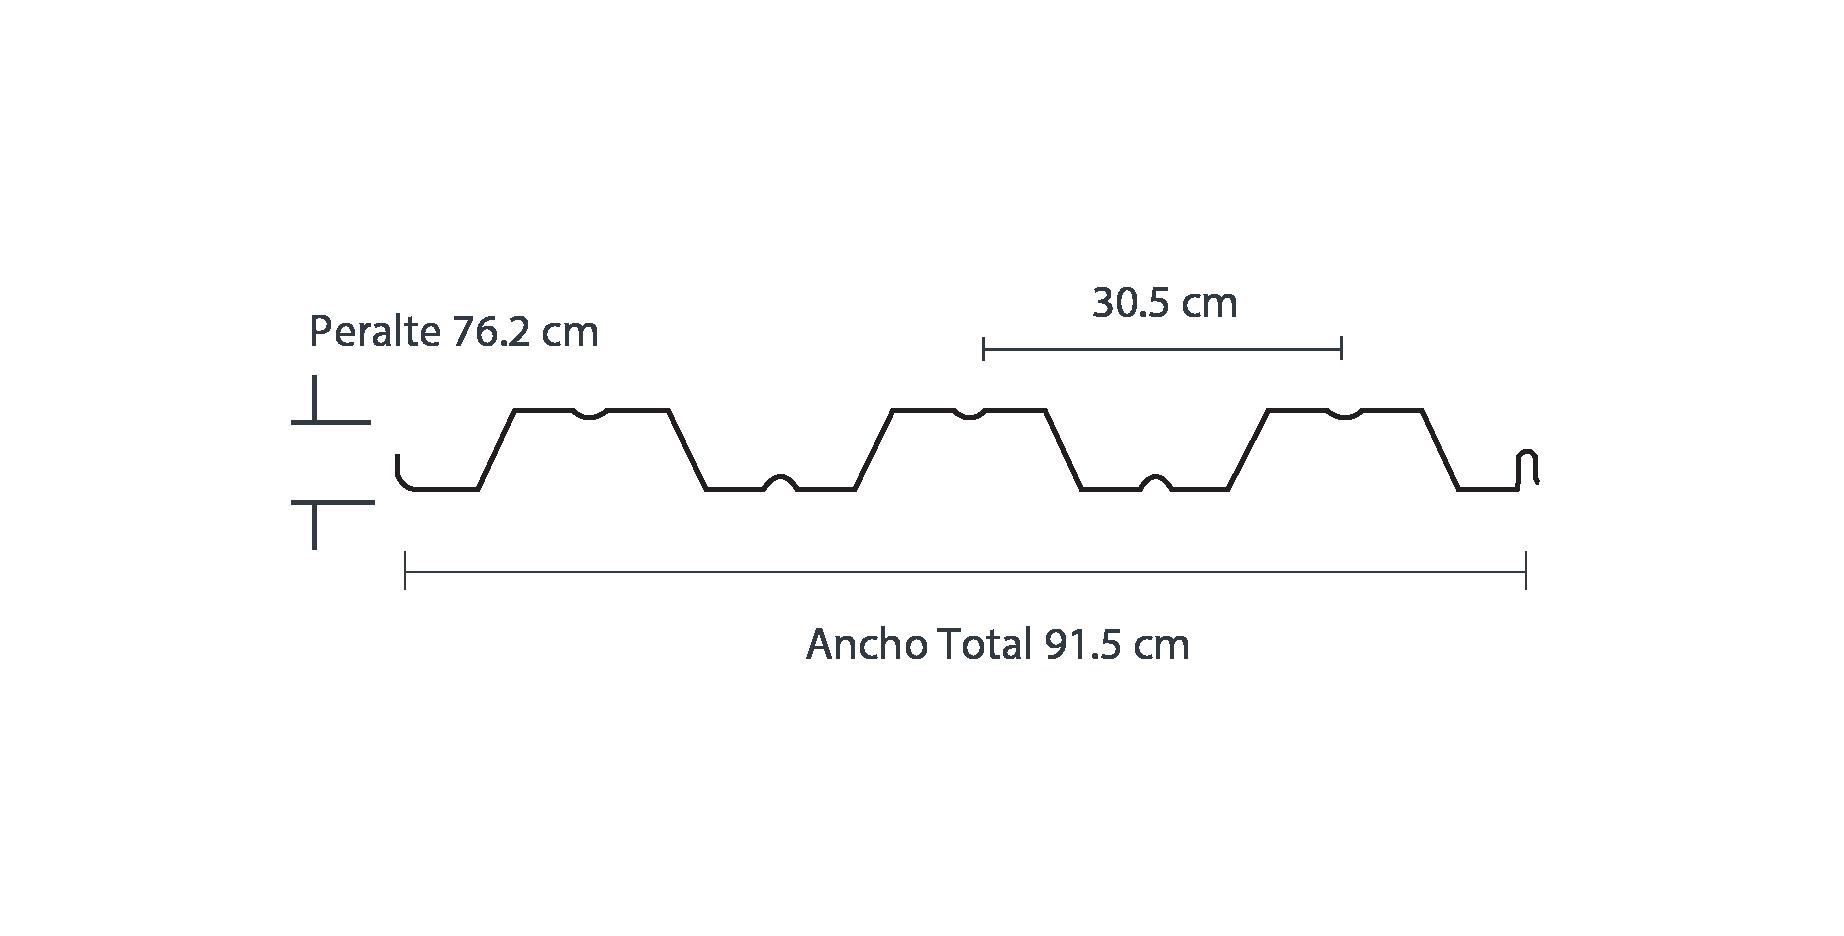 Medidas de la lámina losacero 30; lámina elaborada a partir de acero Ternium galvanizado.